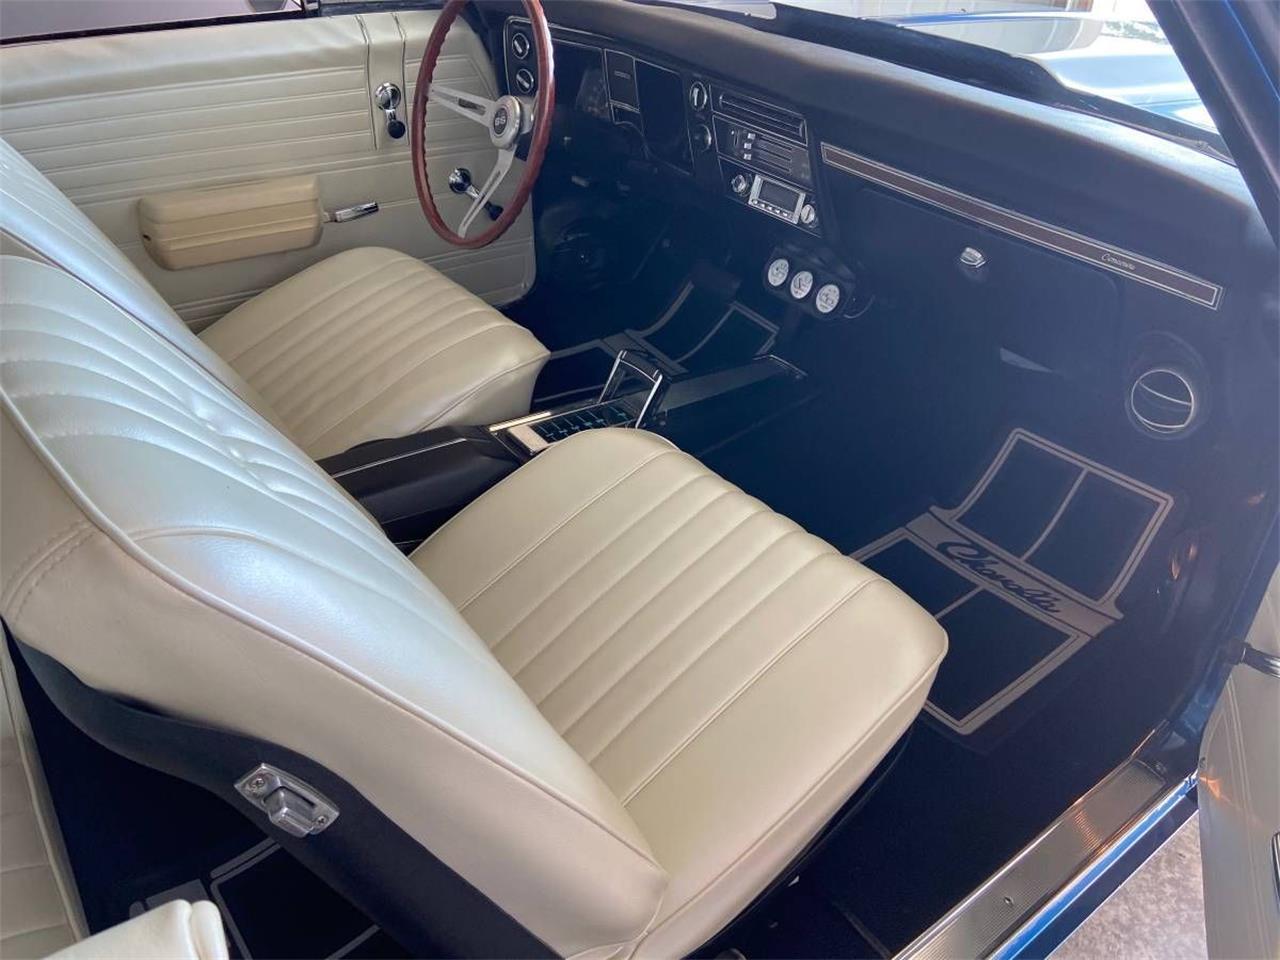 1968 Chevrolet Chevelle Malibu (CC-1413658) for sale in Stratford, New Jersey